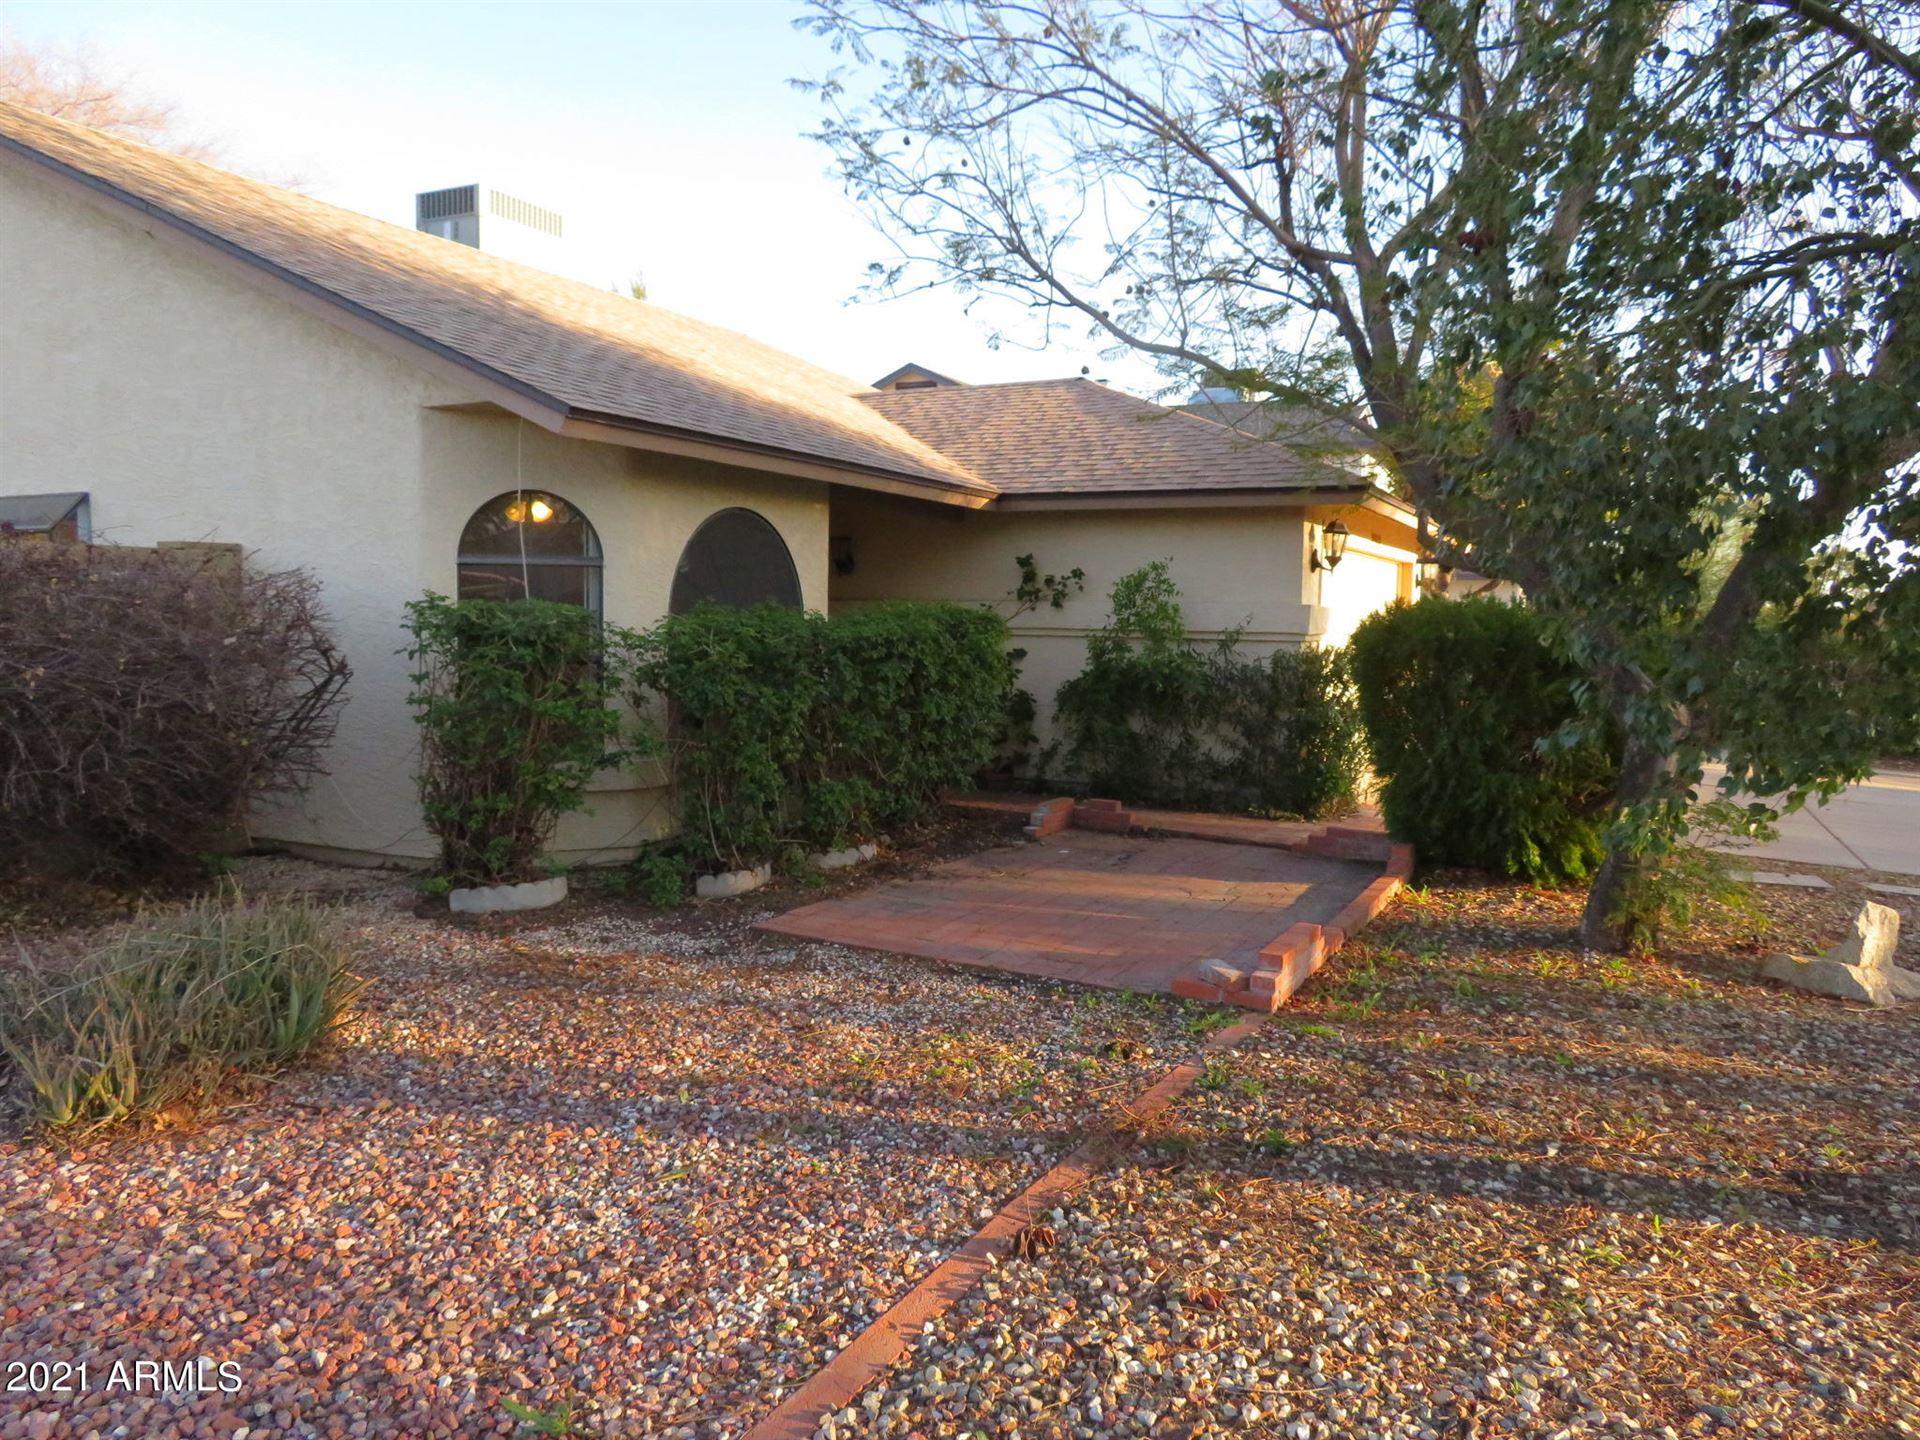 Photo of 24039 N 40th Drive, Glendale, AZ 85310 (MLS # 6200404)